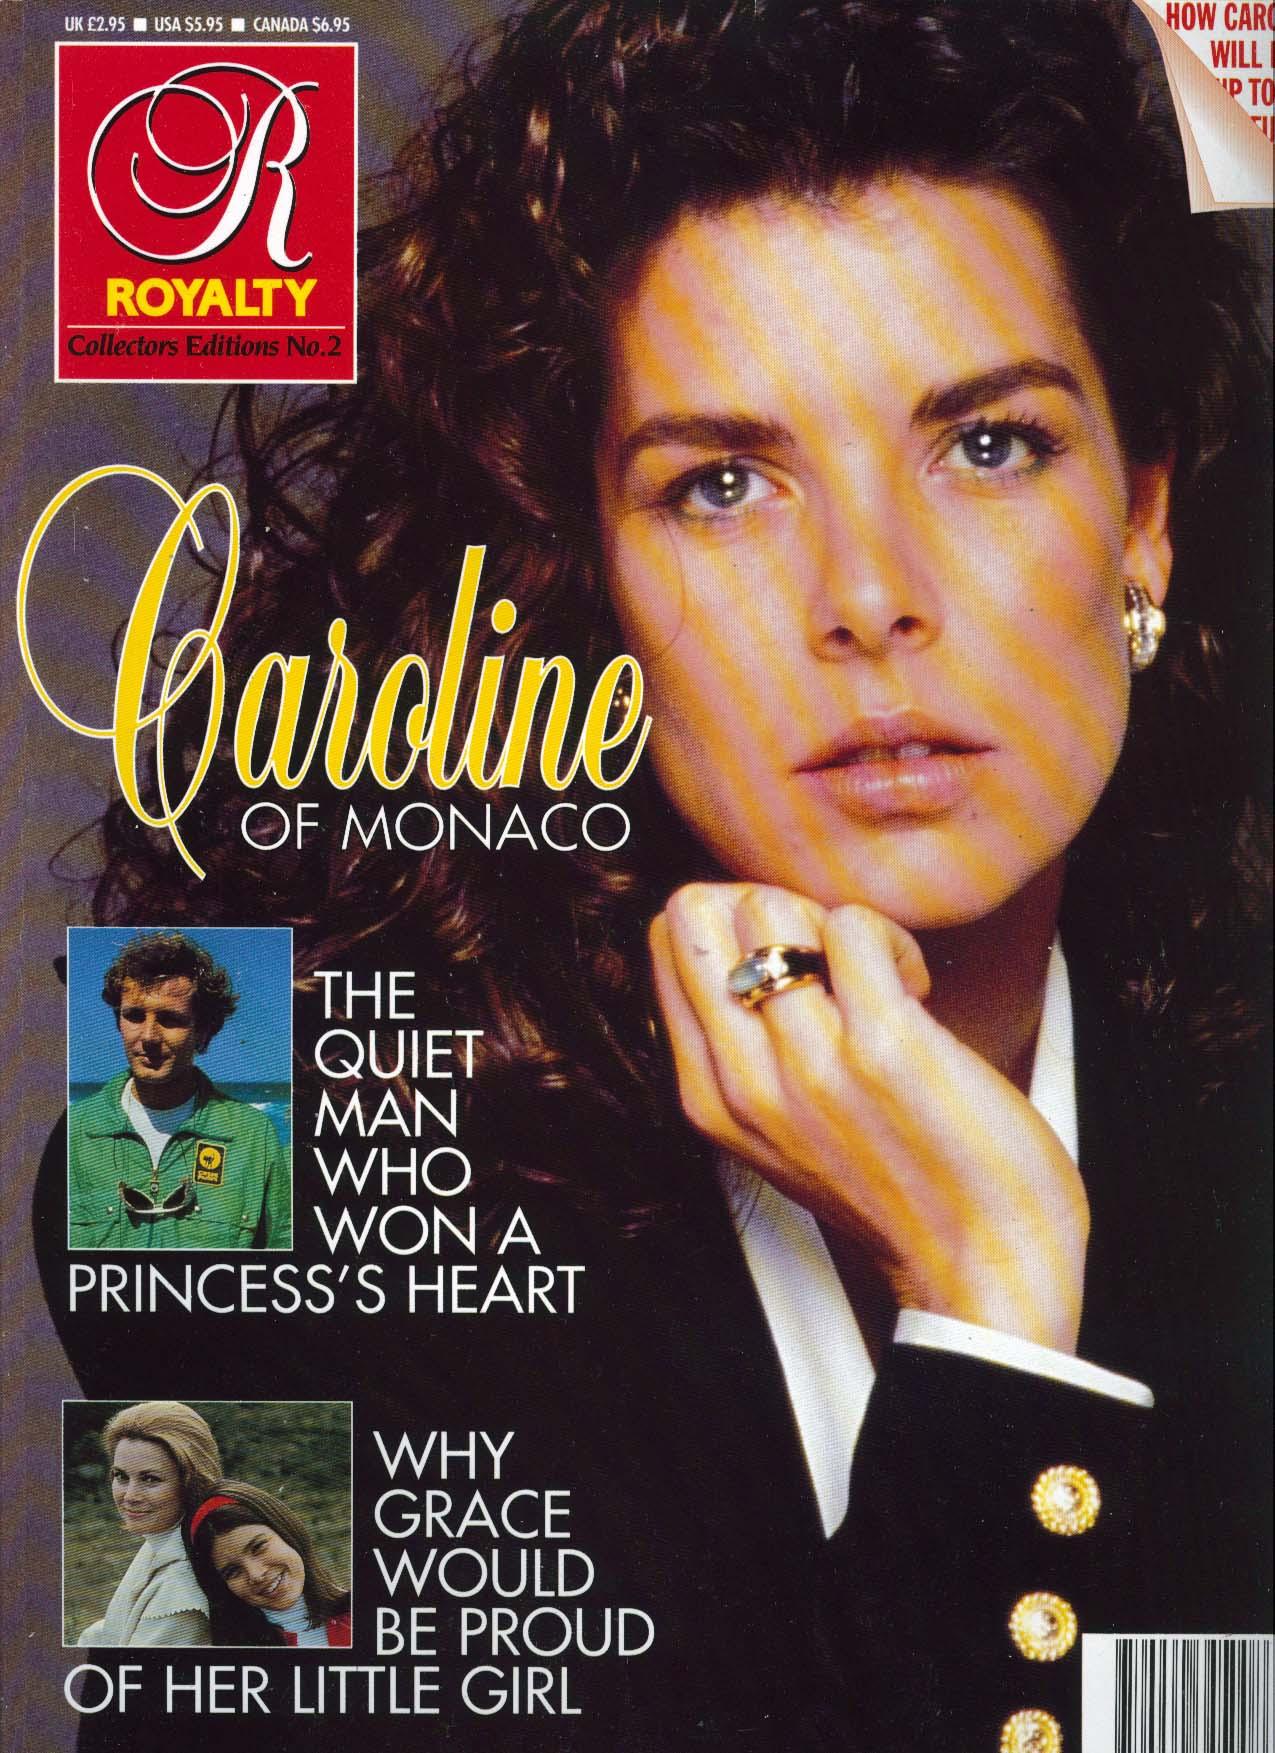 Image for ROYALTY MONTHLY Collectors Editions No. 2 Caroline of Monaco 1990